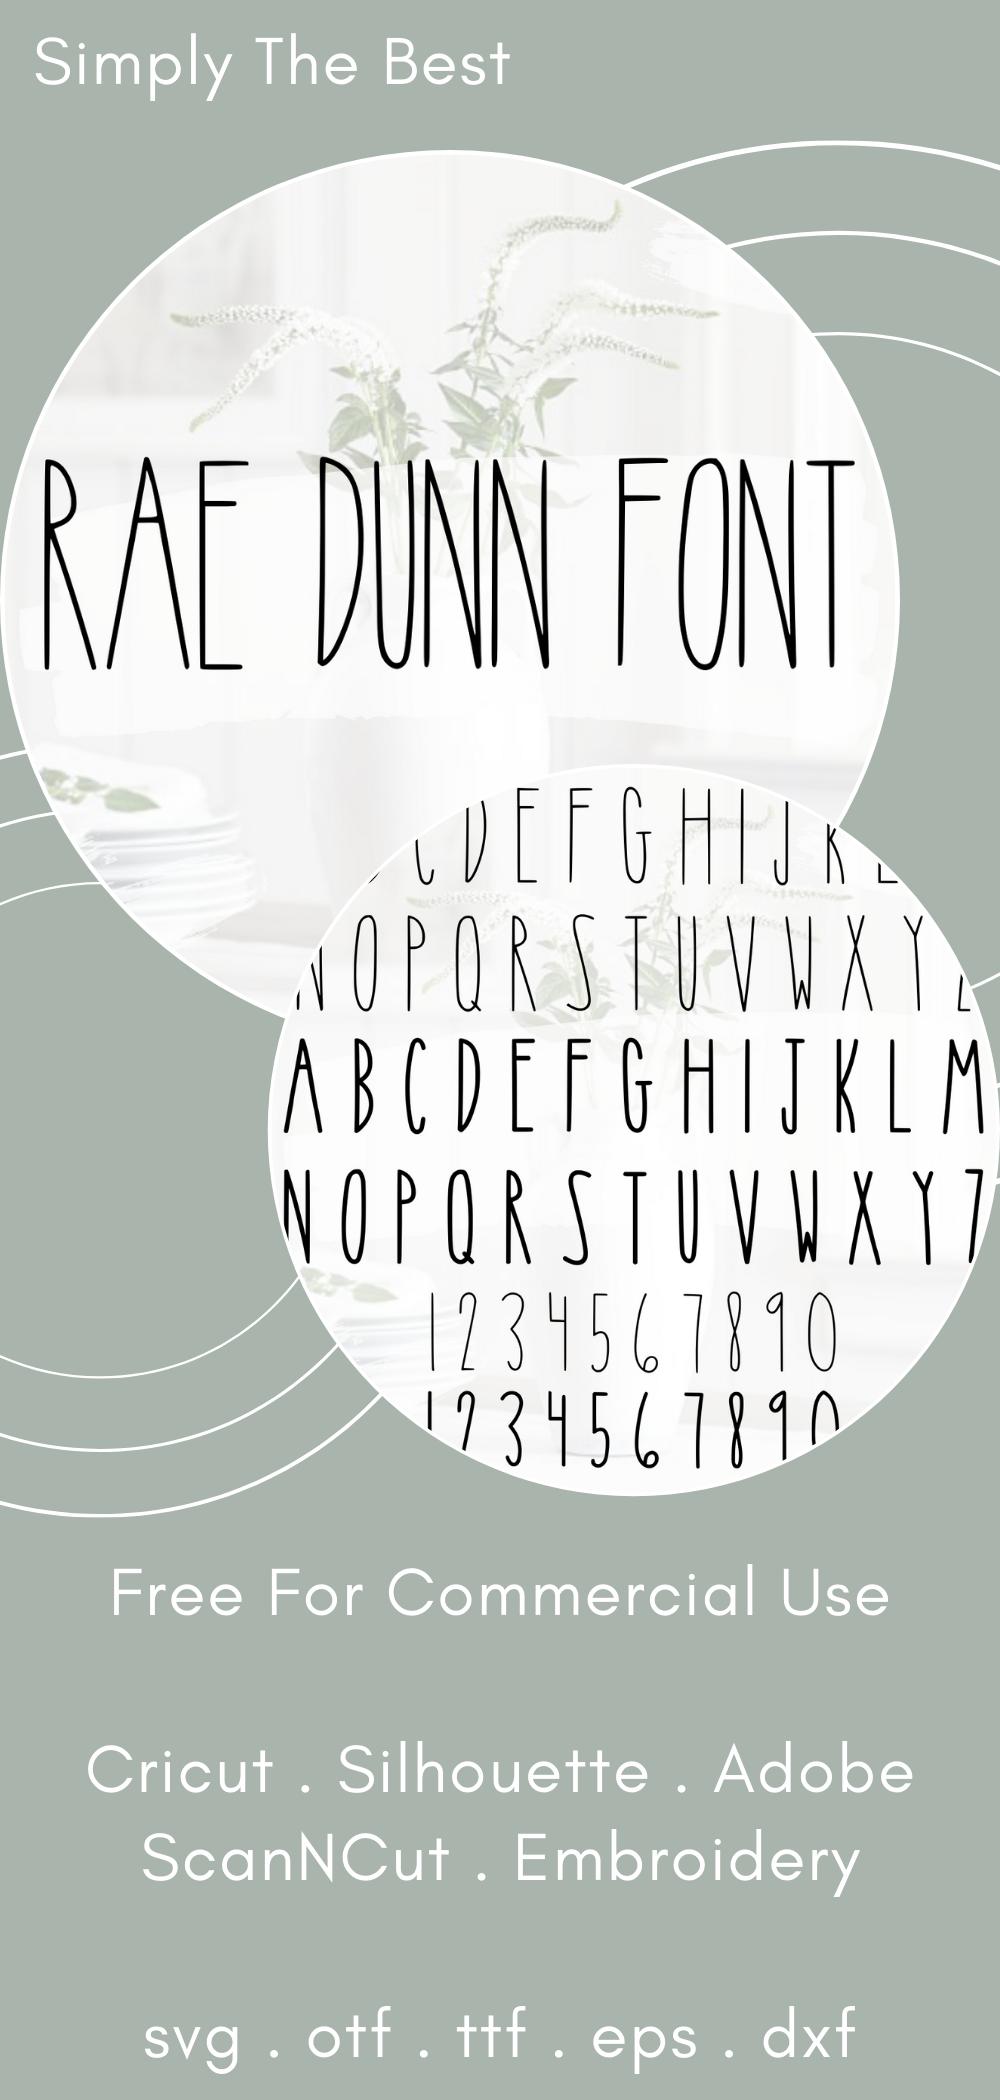 Rae Dunn Font in 2020 Cricut fonts, Cricut, Silhouette fonts